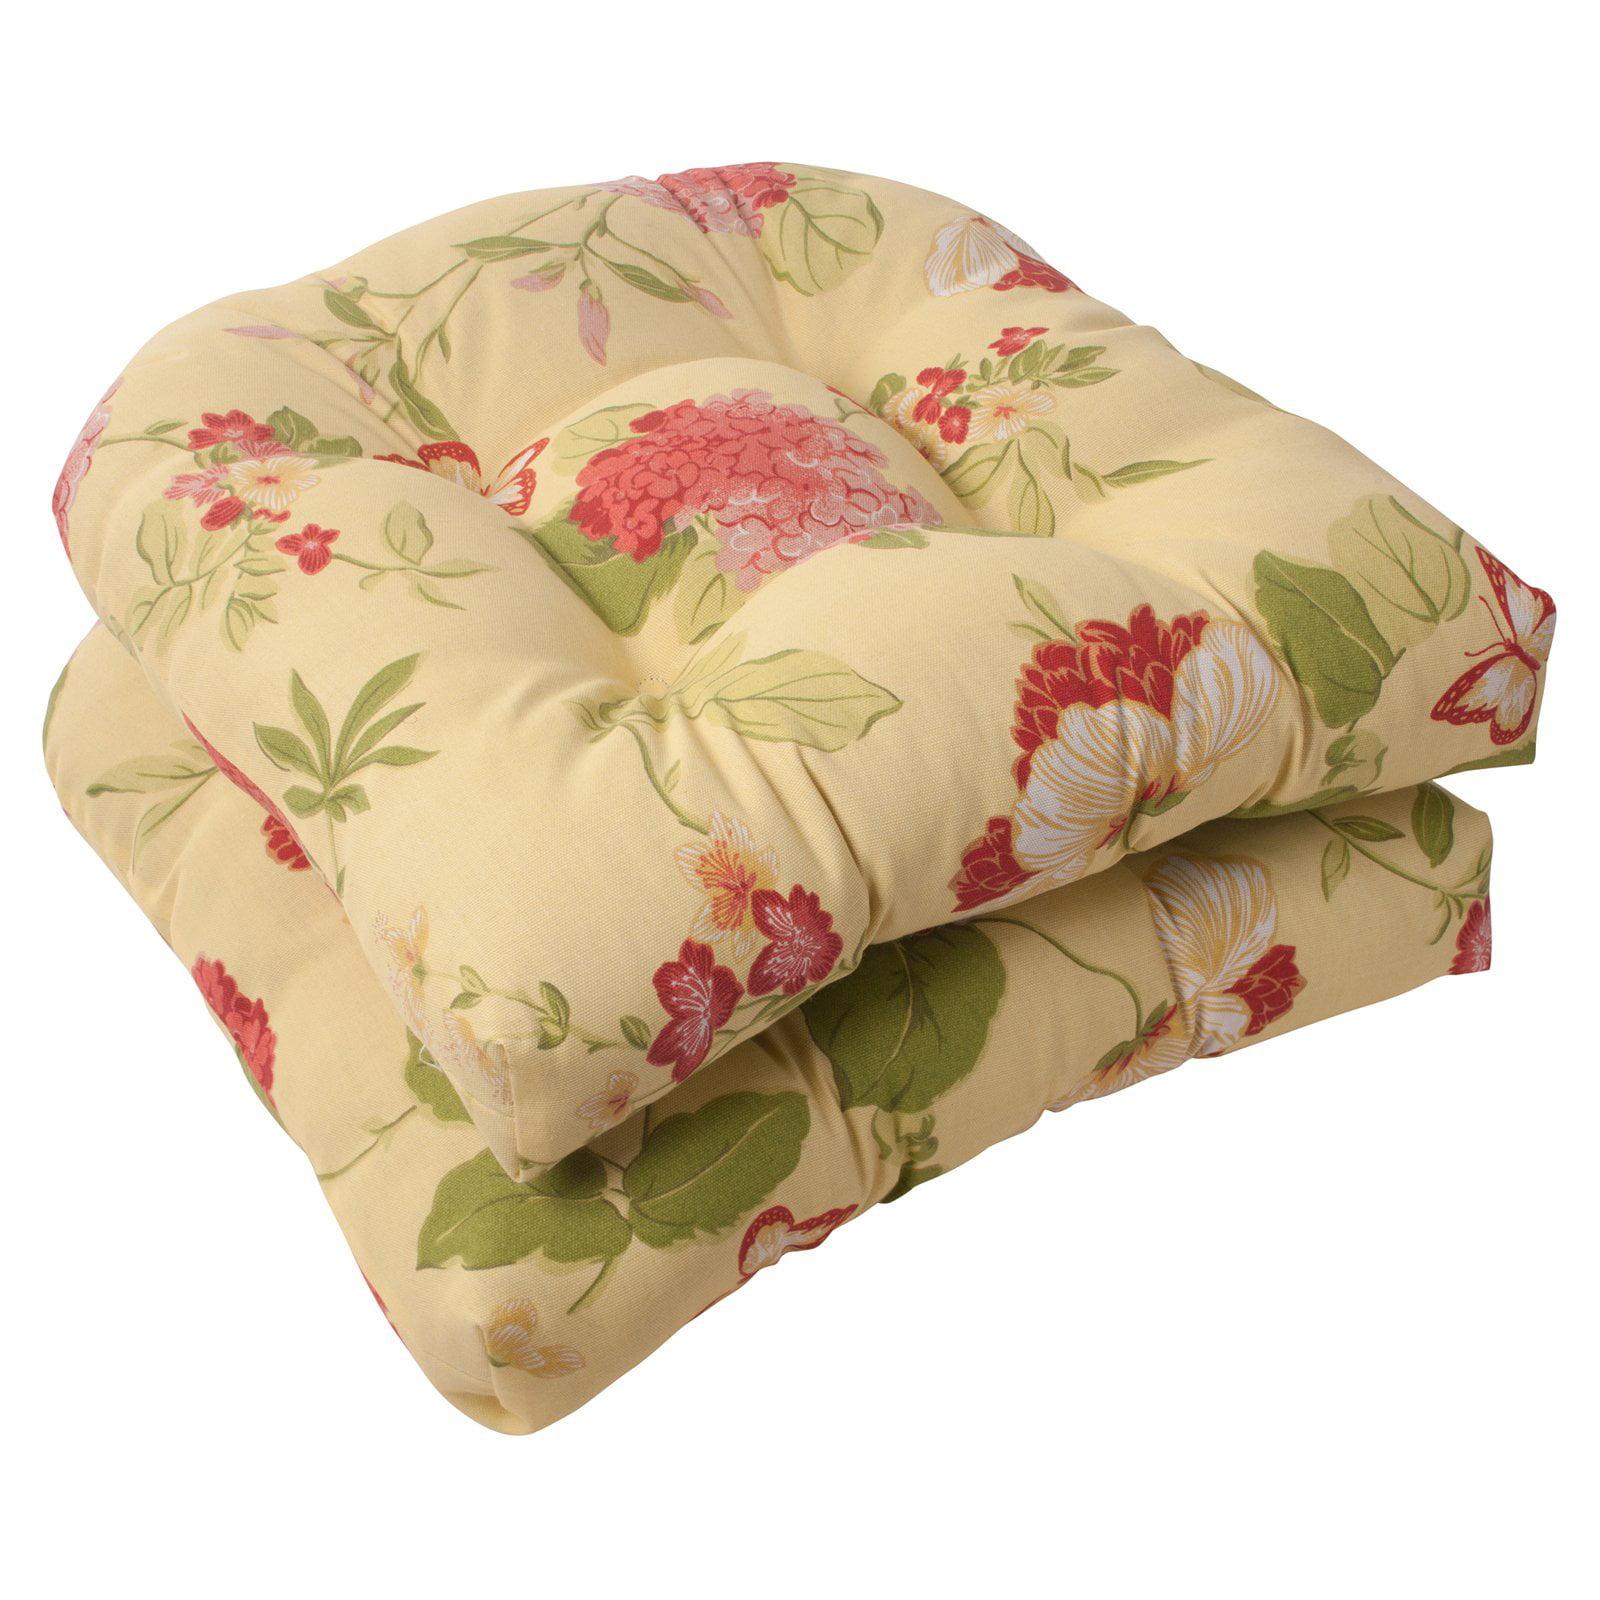 Pillow Perfect Outdoor Indoor Risa Lemonade Wicker Seat Cushion Set Of 2 Walmart Com Walmart Com